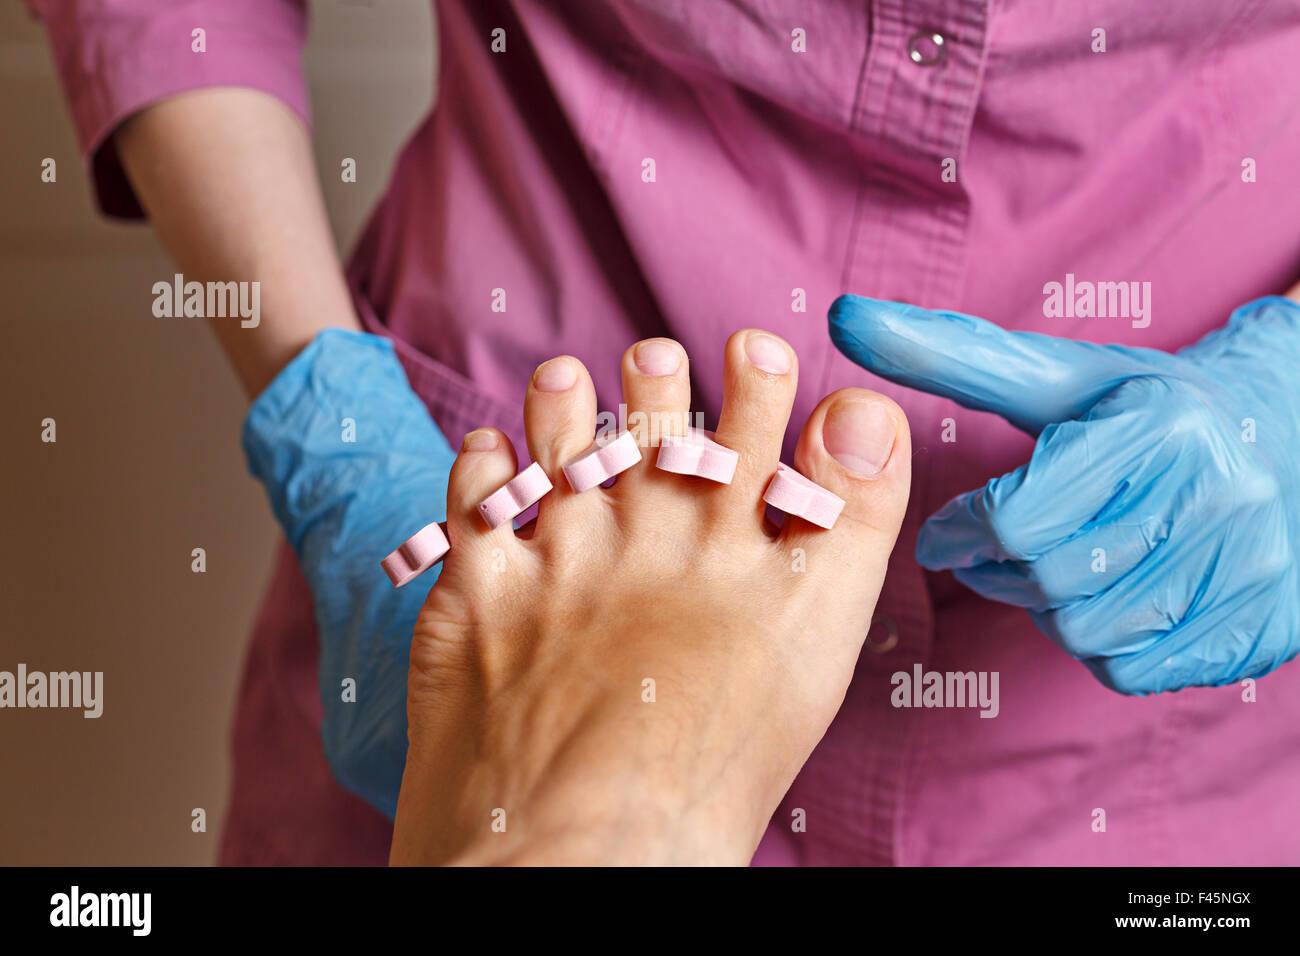 Master chiropody rubbing alcohol, fingernails polish before applying